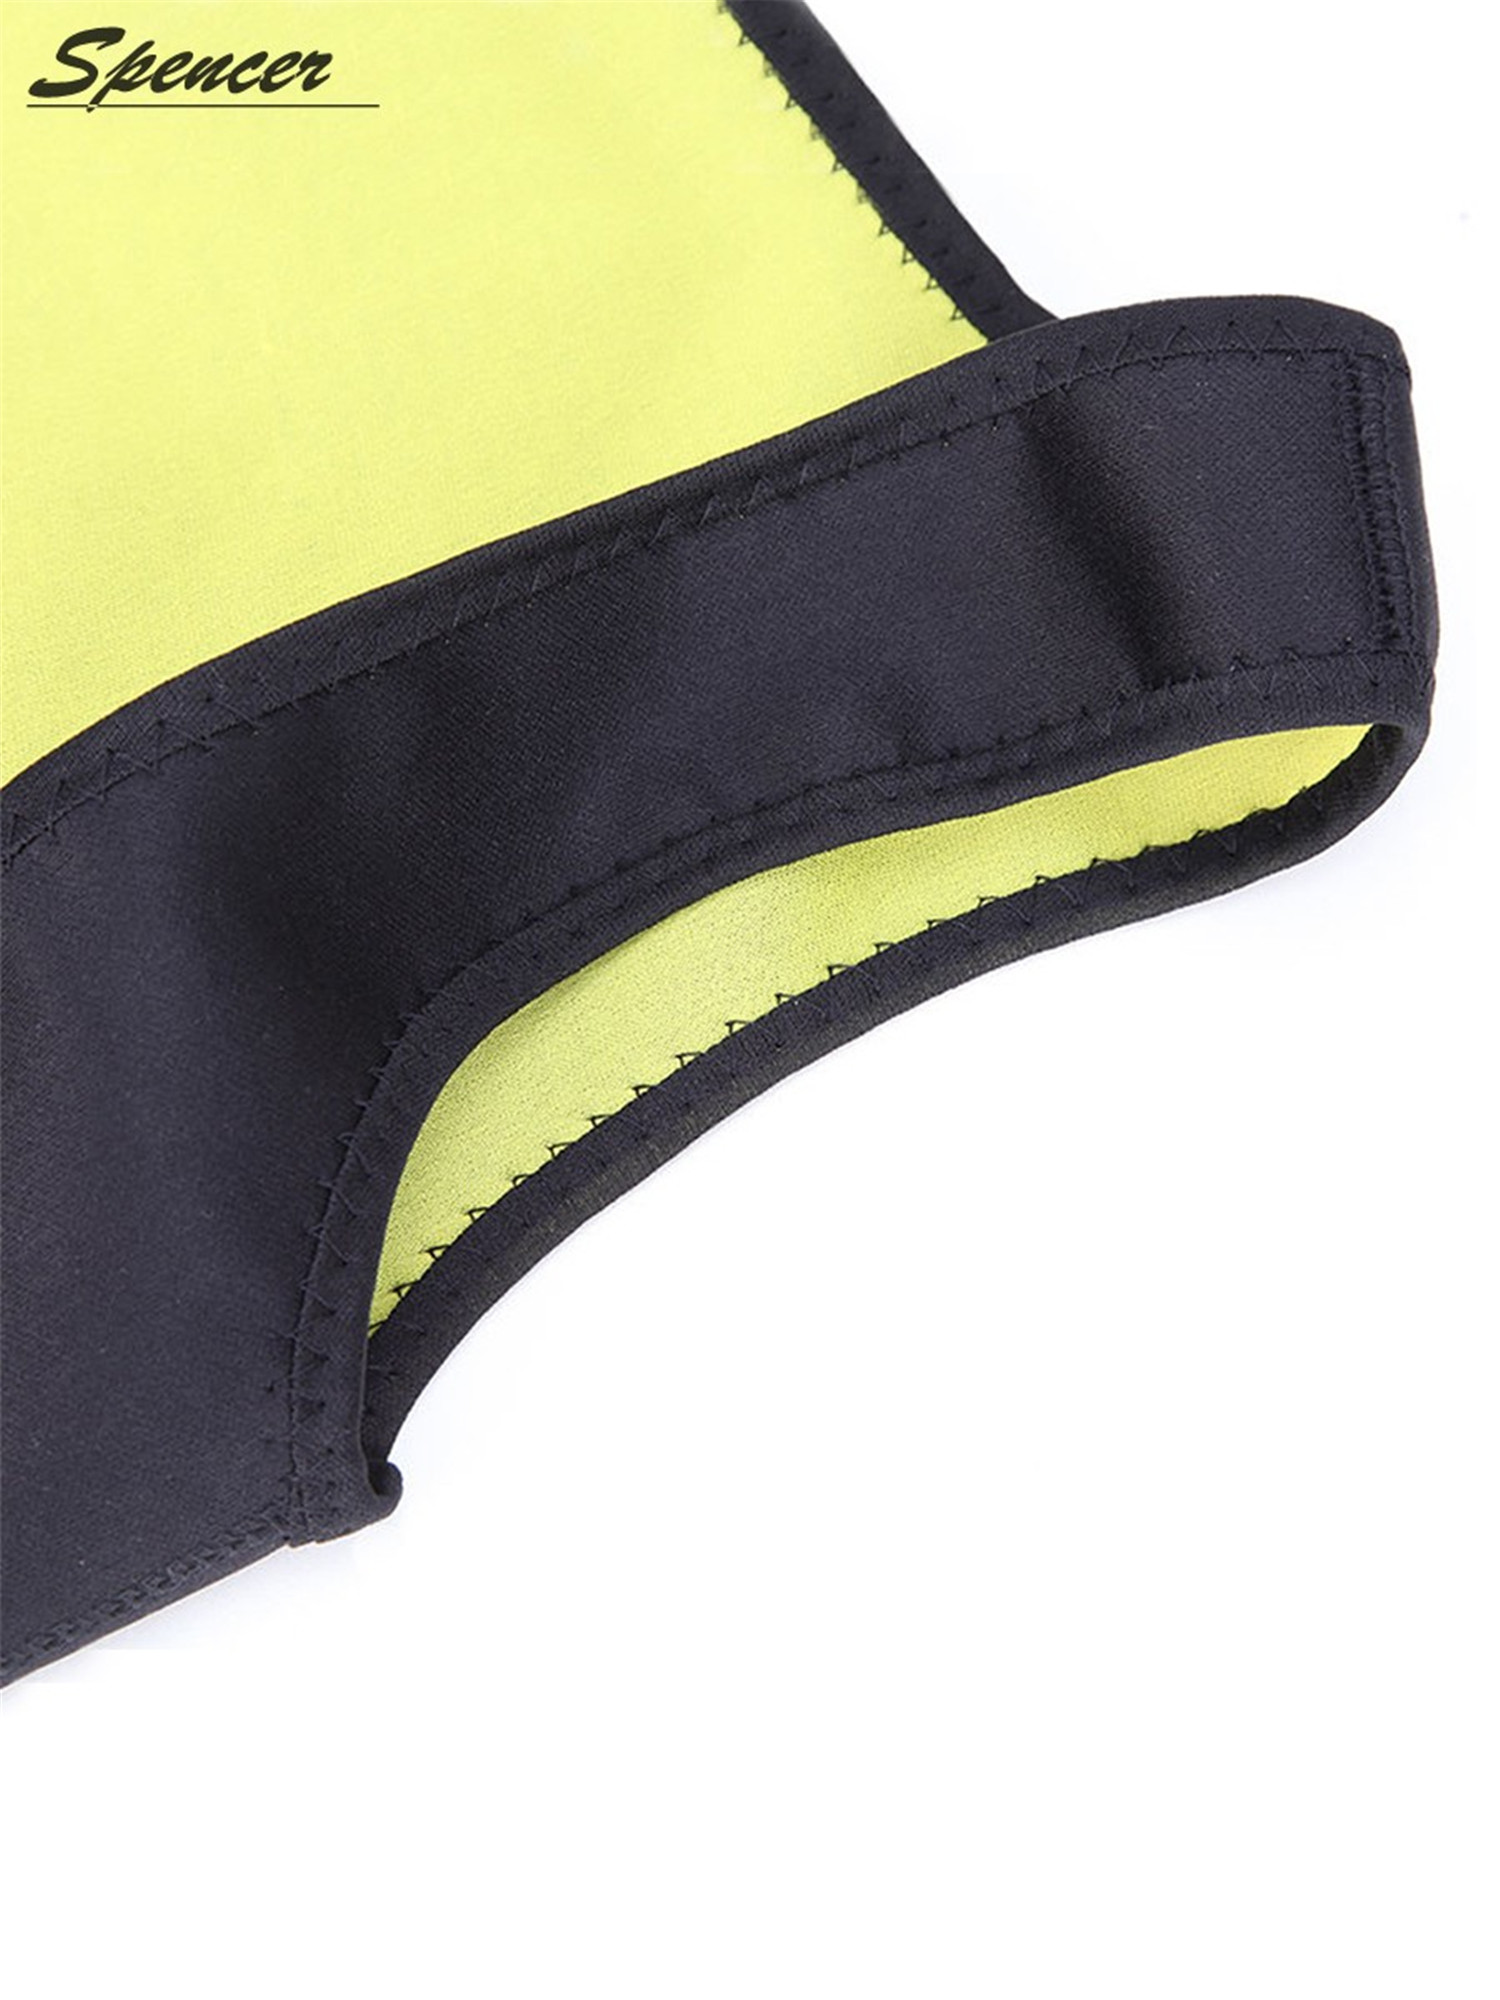 4b5ad3814a SPENCER - Spencer Women Body Shaper Waist Trainer Cincher Slim Yoga Corset  Vest Slimming Shapewear